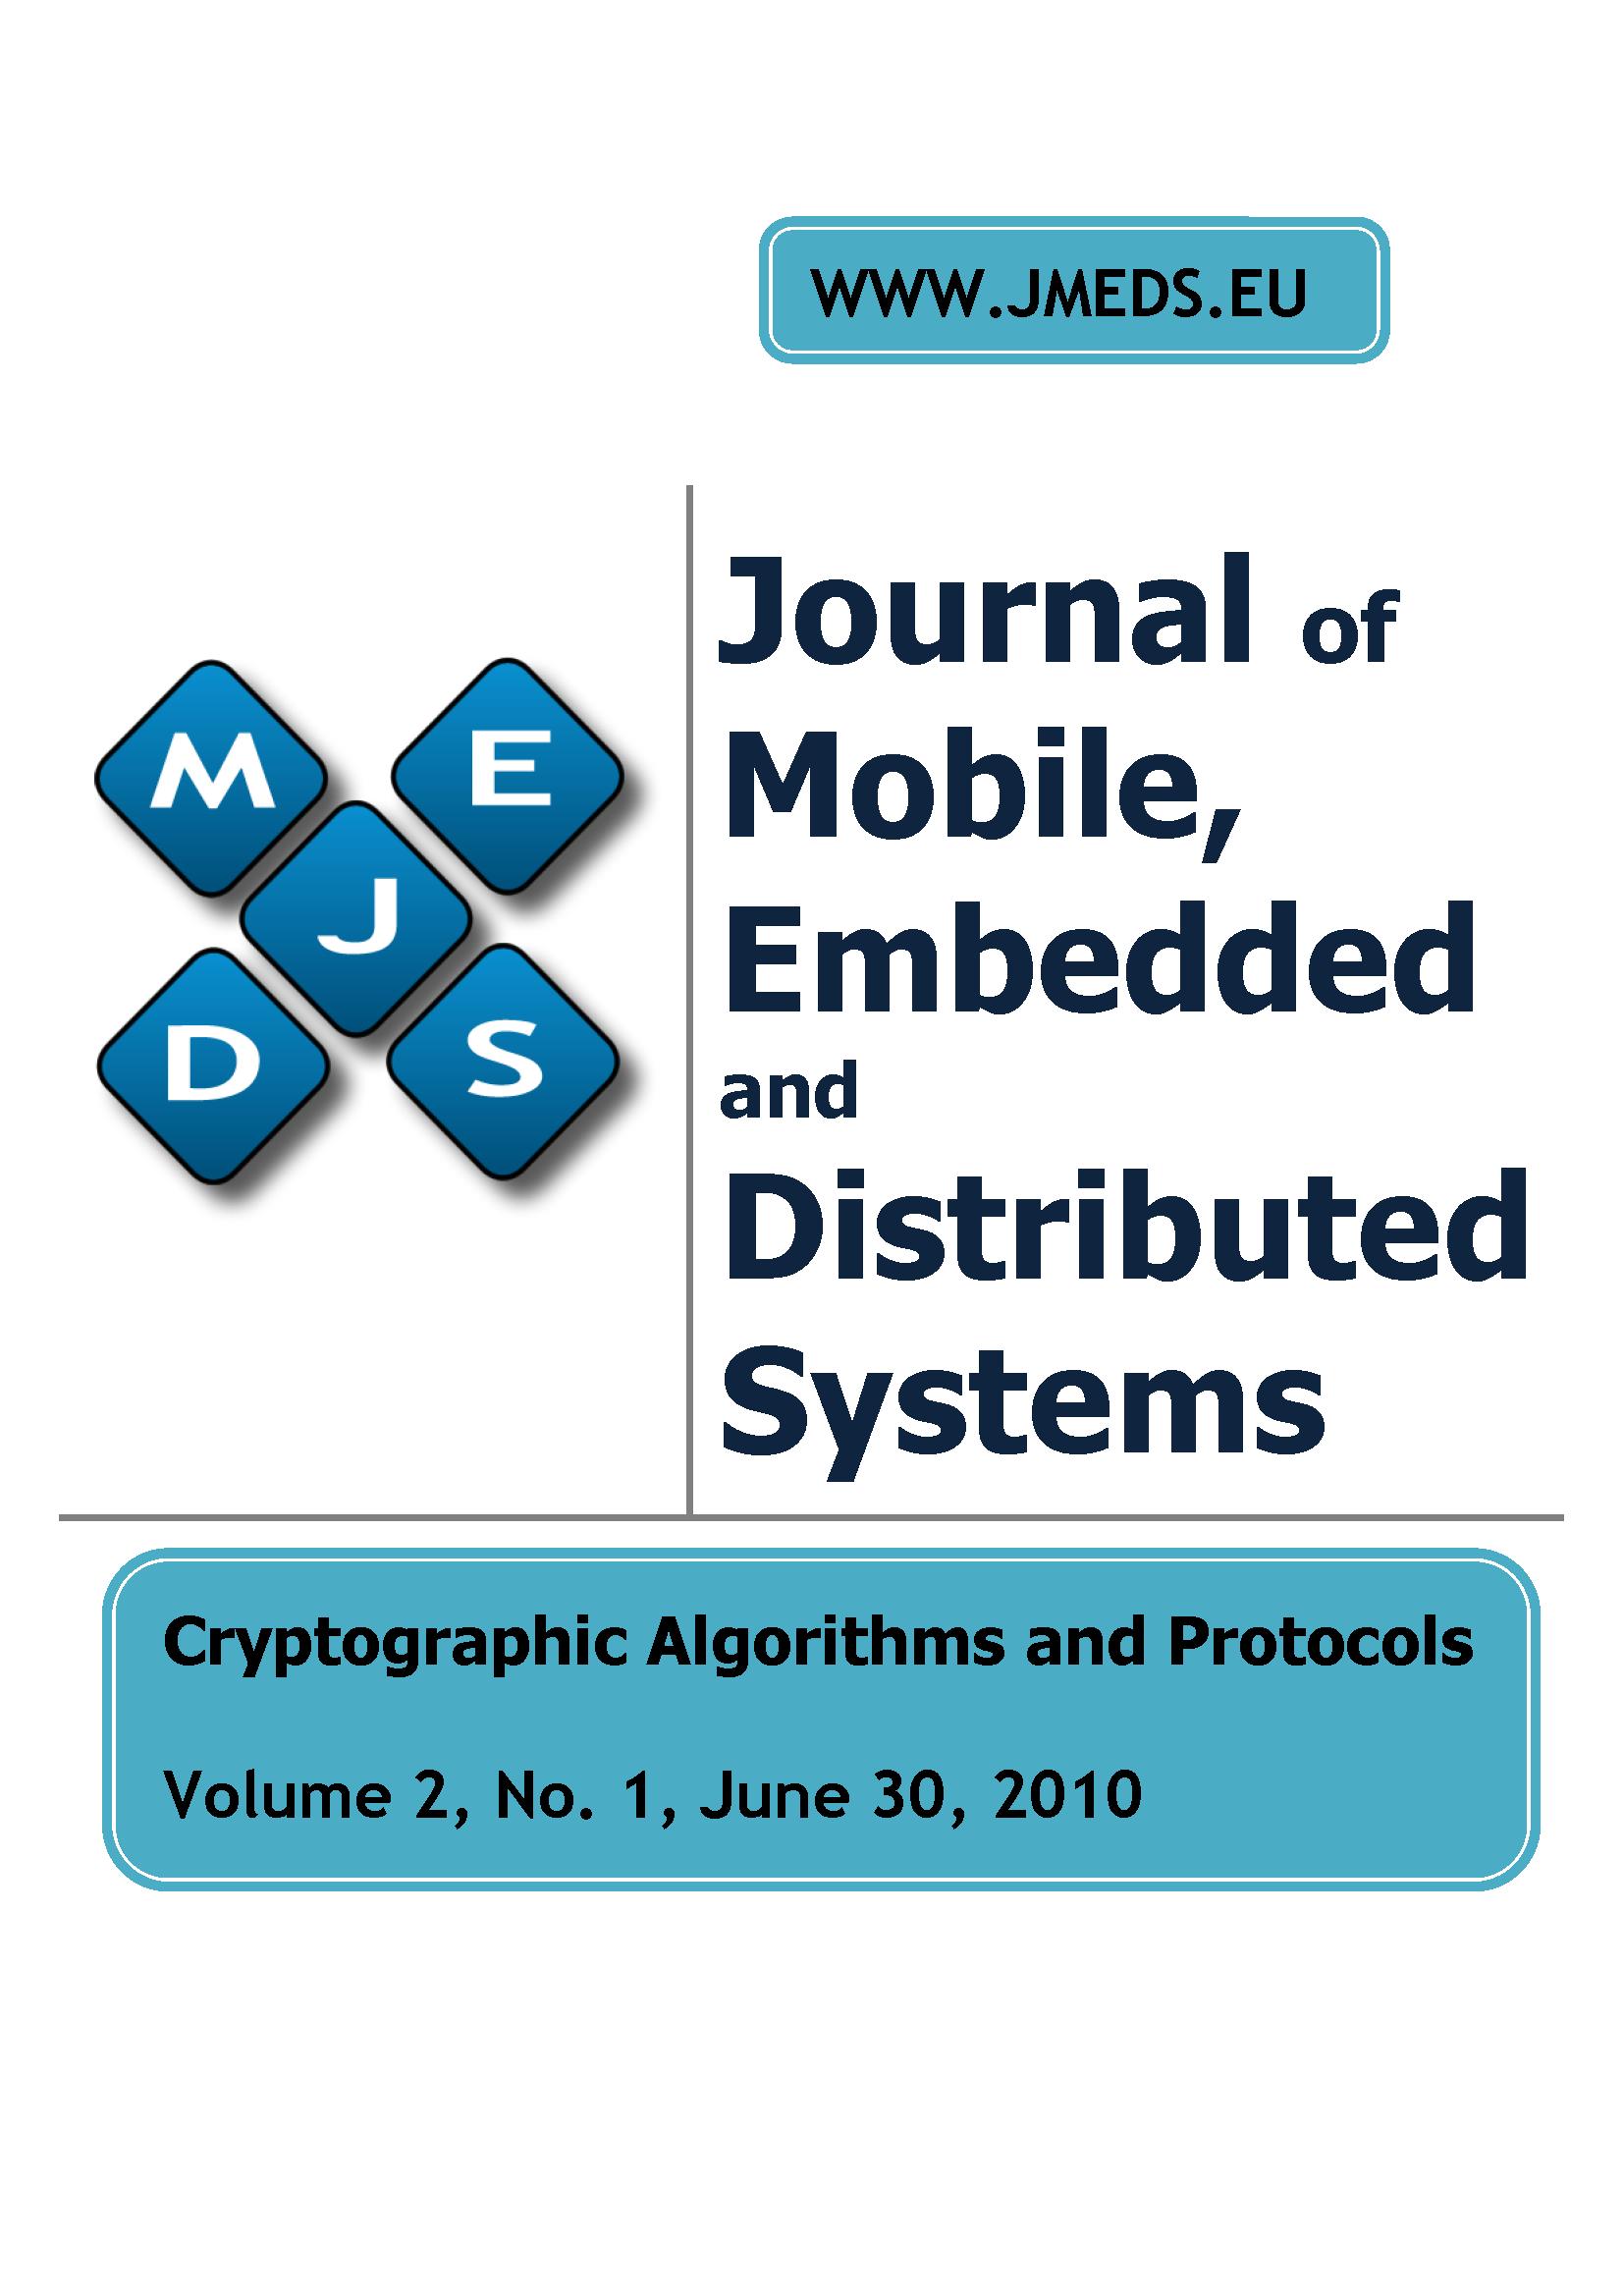 JMEDS, vol 2, no 1, 2010, Cryptographic Algorithms and Protocols